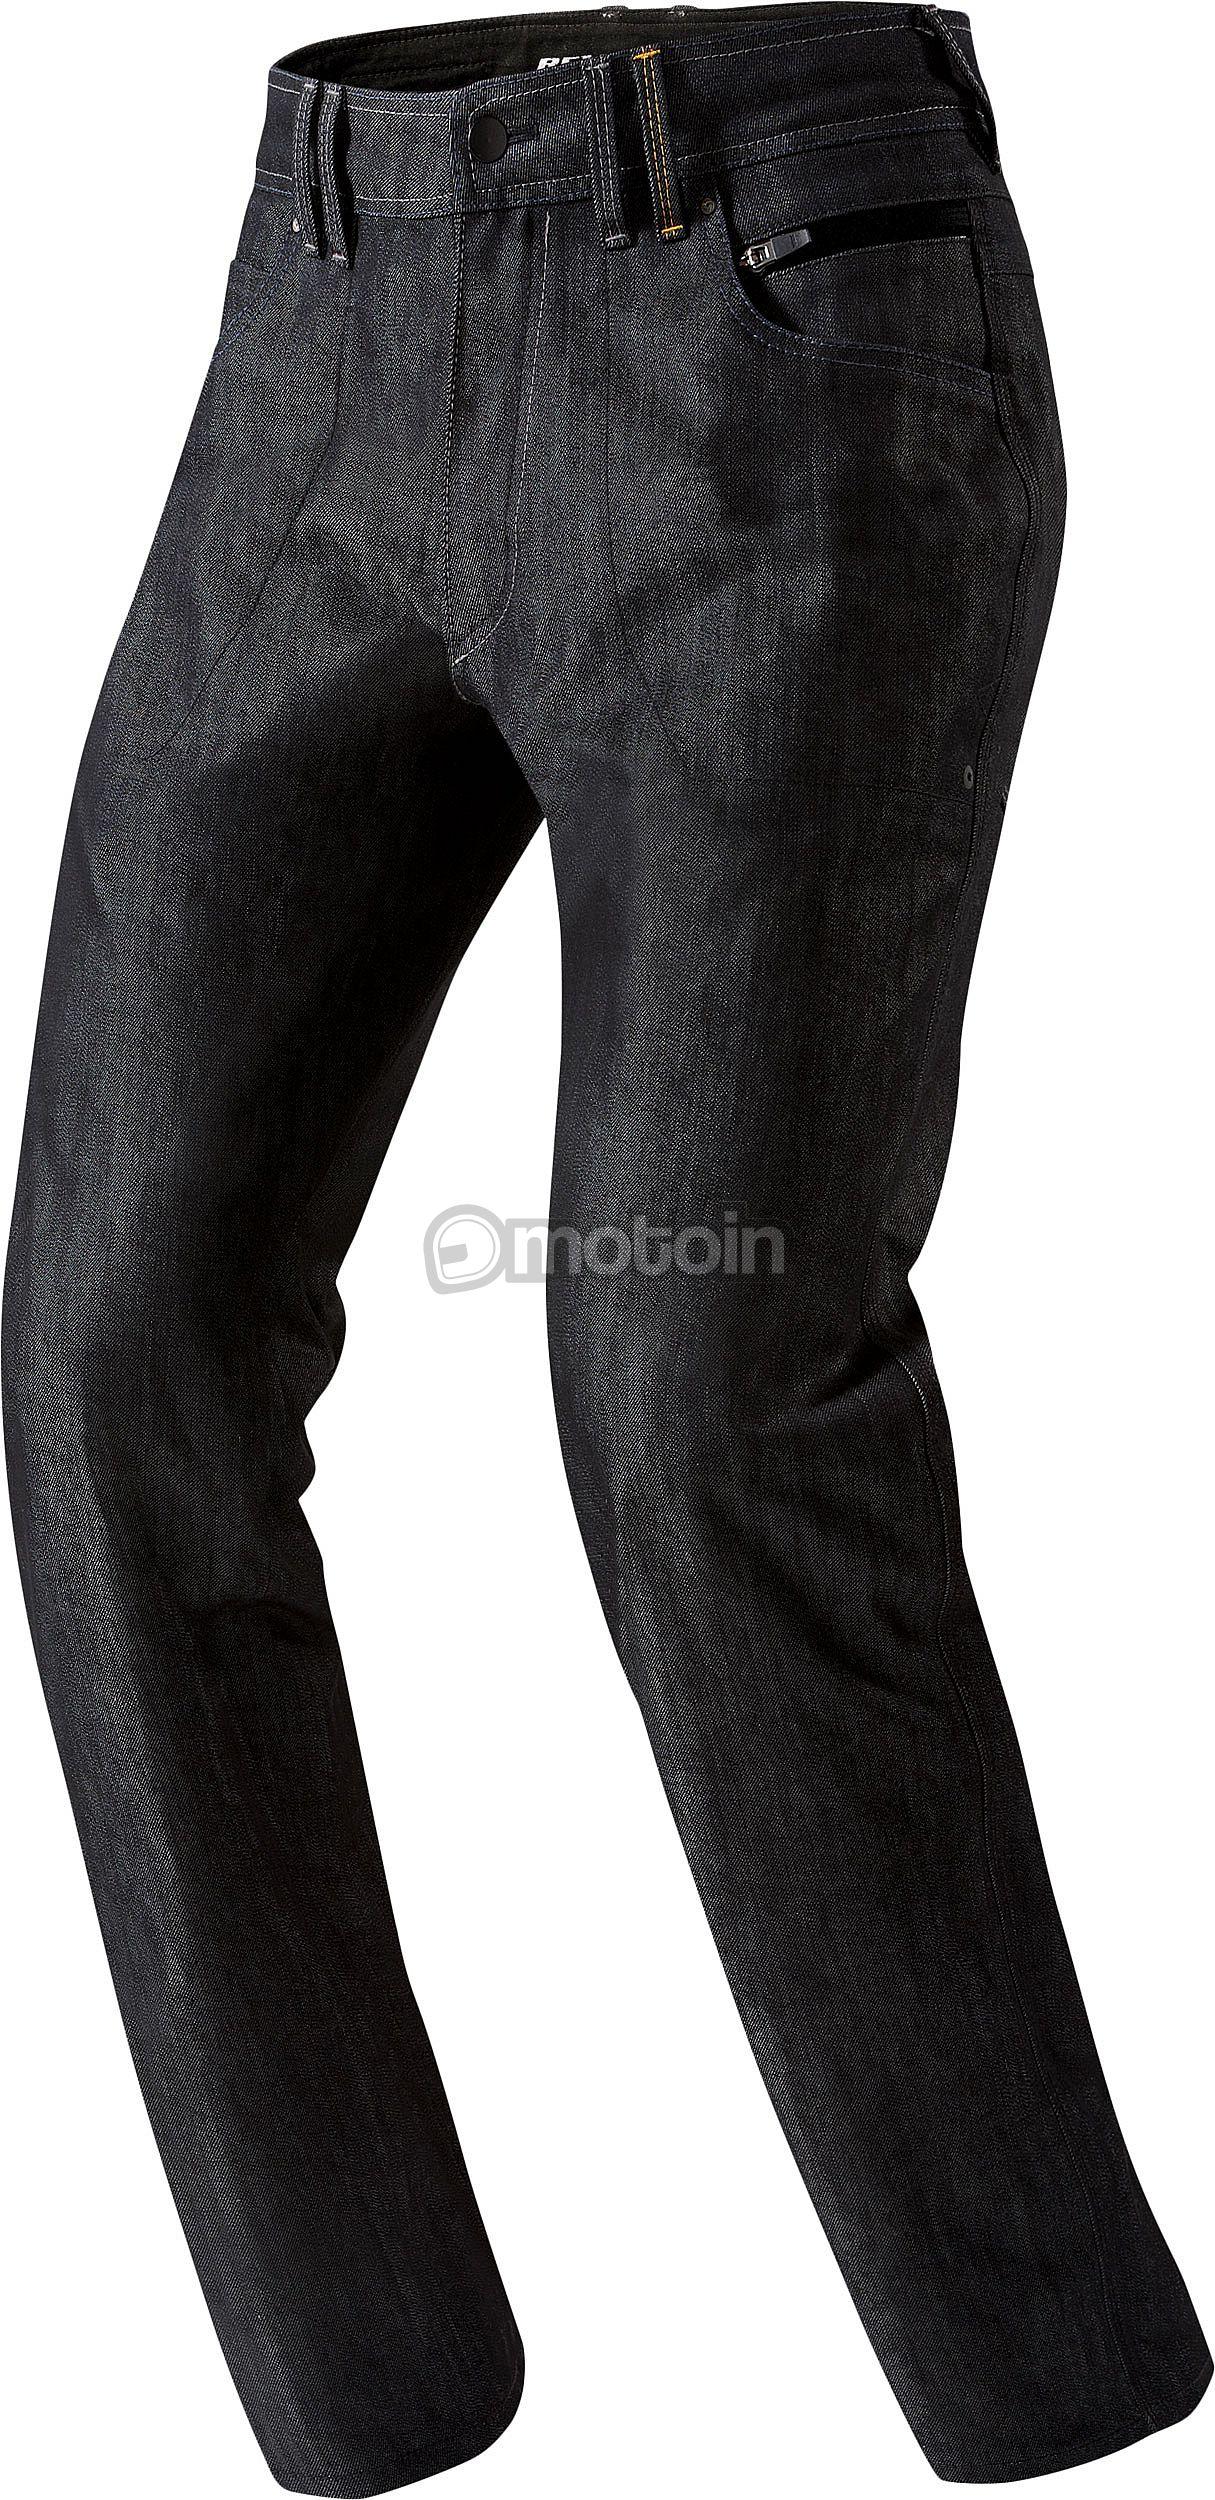 revit memphis h2o jeans wasserdicht. Black Bedroom Furniture Sets. Home Design Ideas